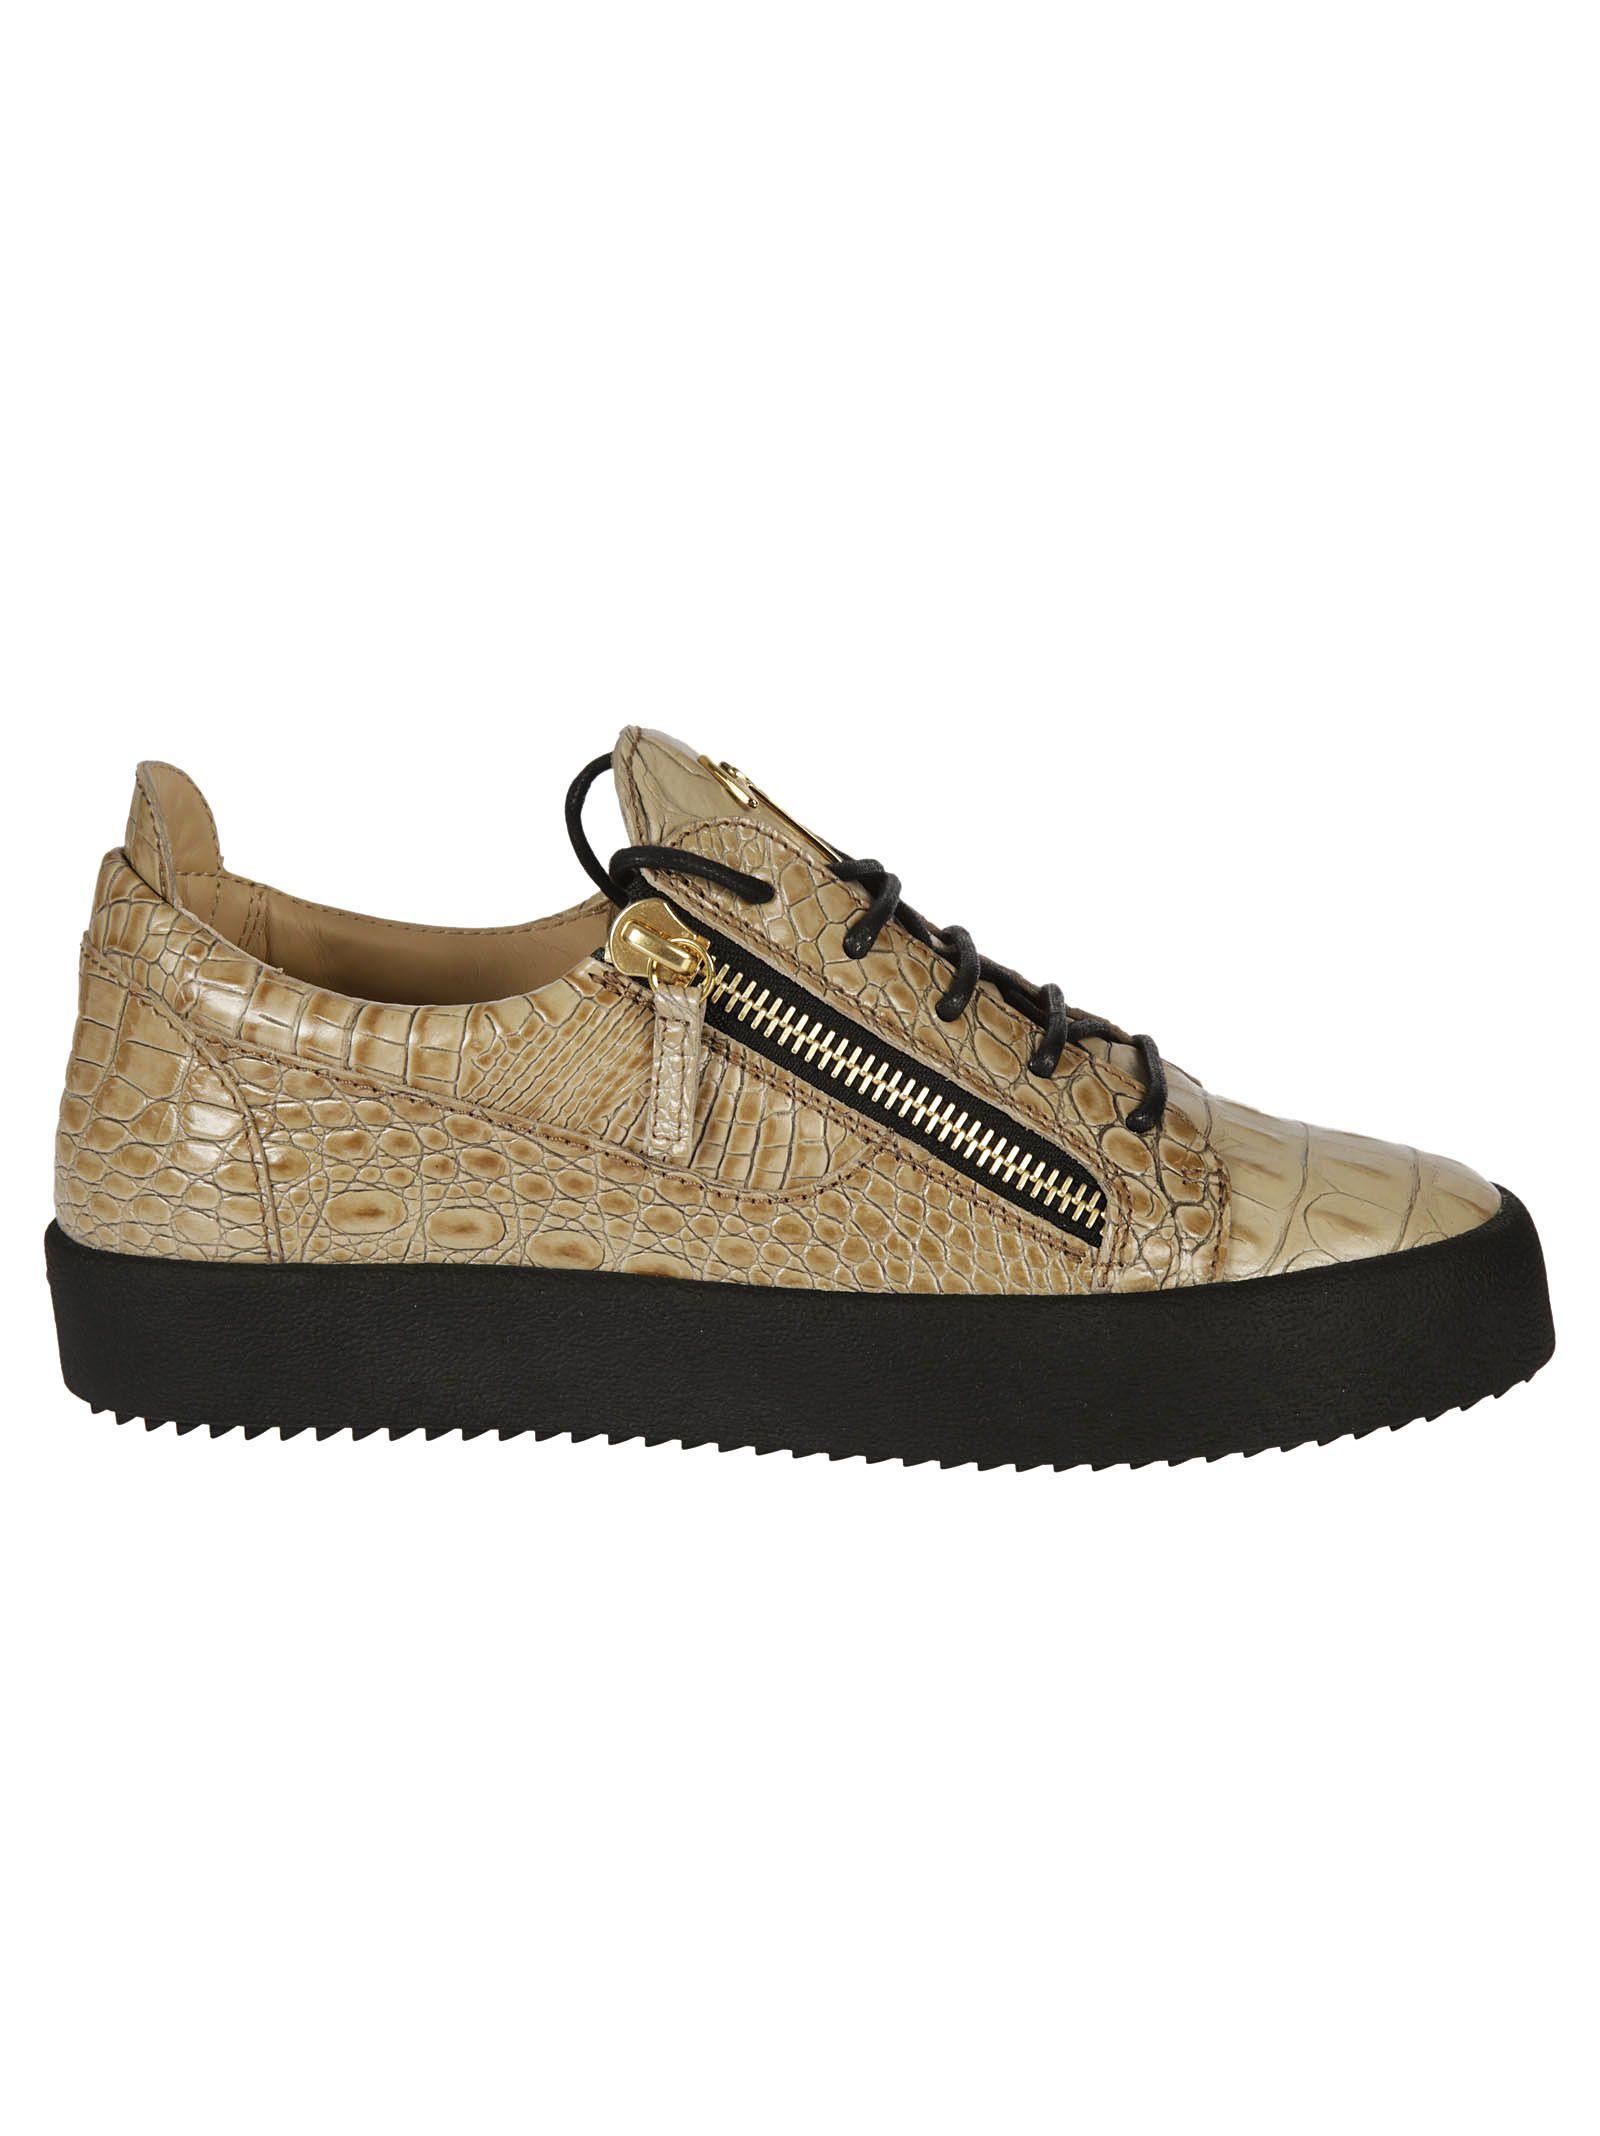 Giuseppe Zanotti Giuseppe Zanotti Frankie Sneakers